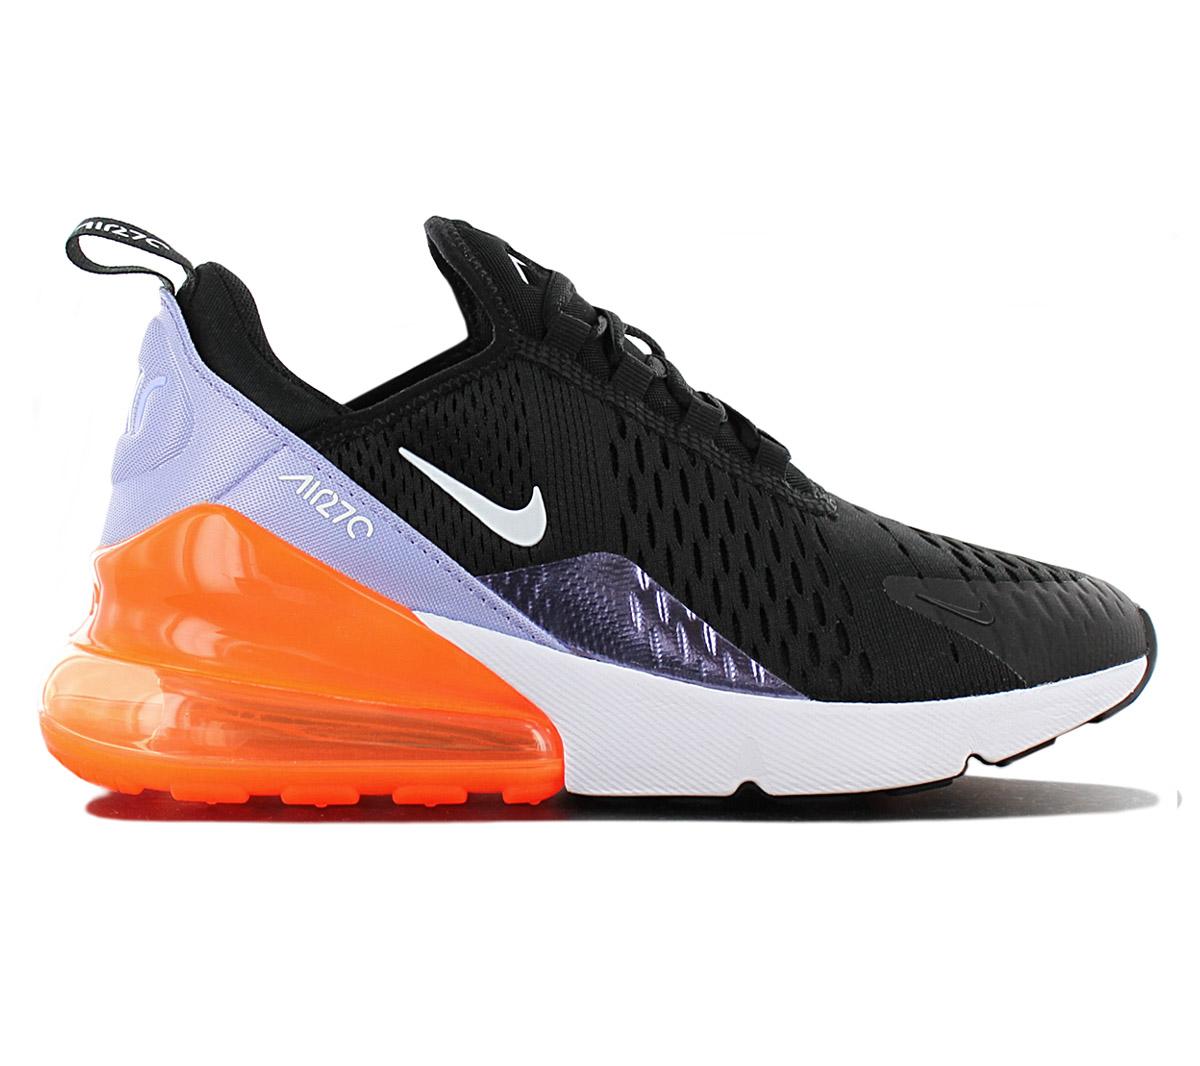 Nike Schuh Nike Air Max 270 thunder greyblack desert sand 42   8.5